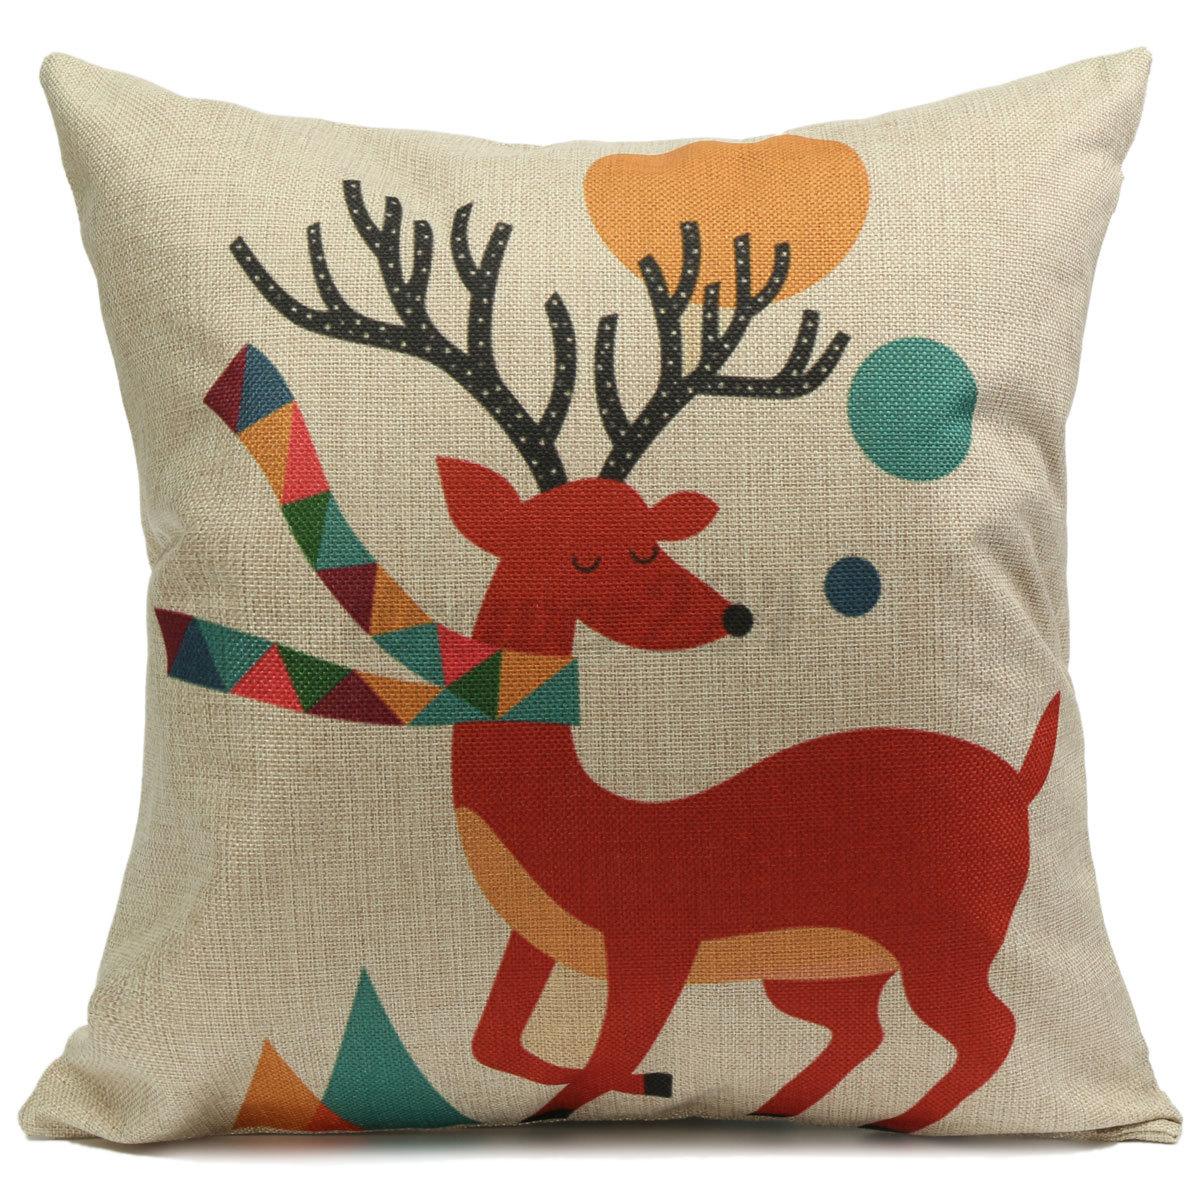 Vintage Animal Marine Cartoon Cotton Linen Throw Pillow Cushion Cover Case Home eBay